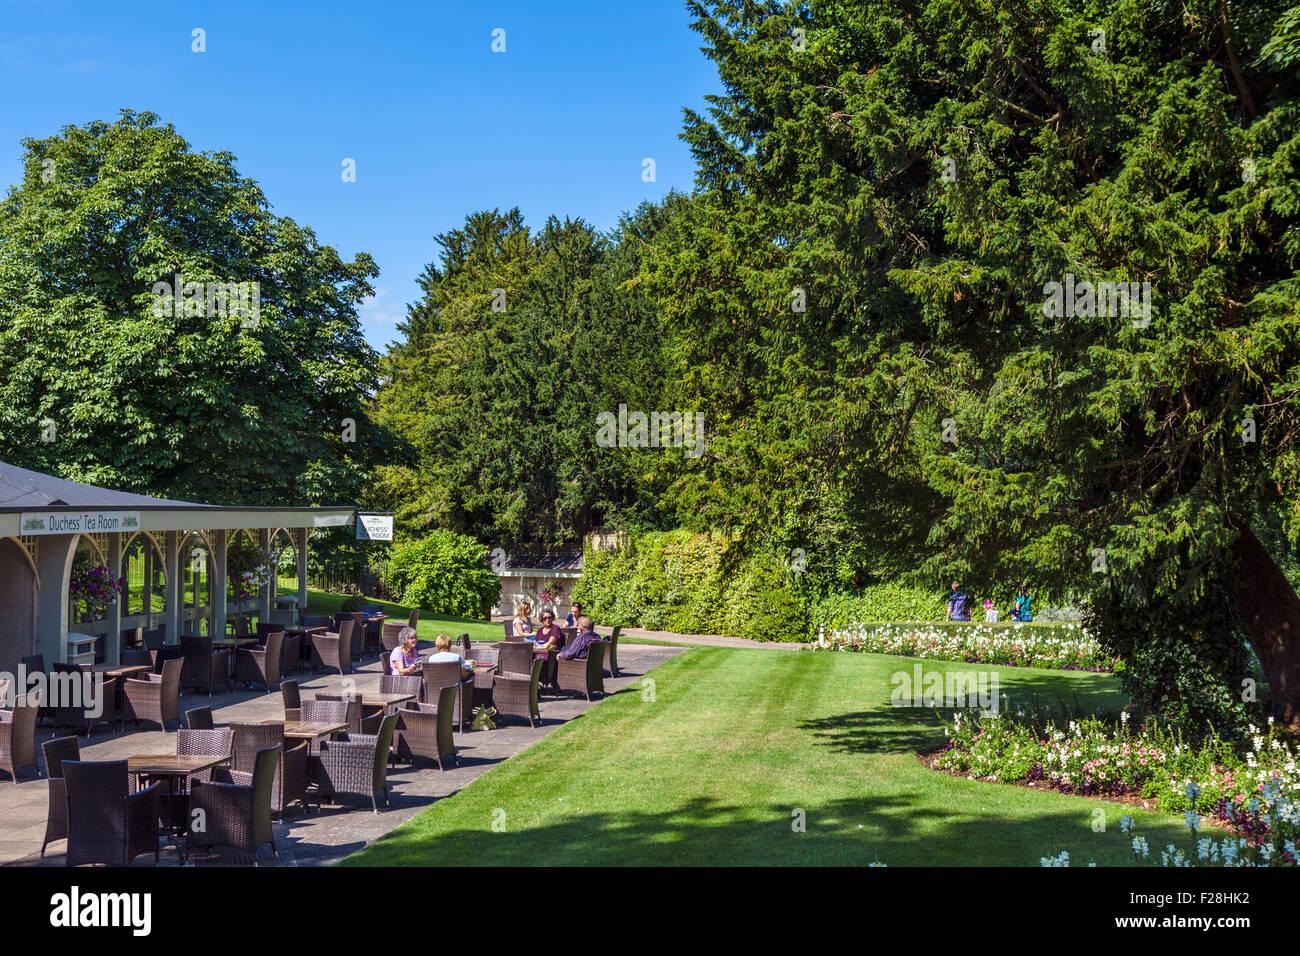 The Duchess' Tea Room at Woburn Abbey, Woburn, Bedfordshire, England, UK - Stock Image